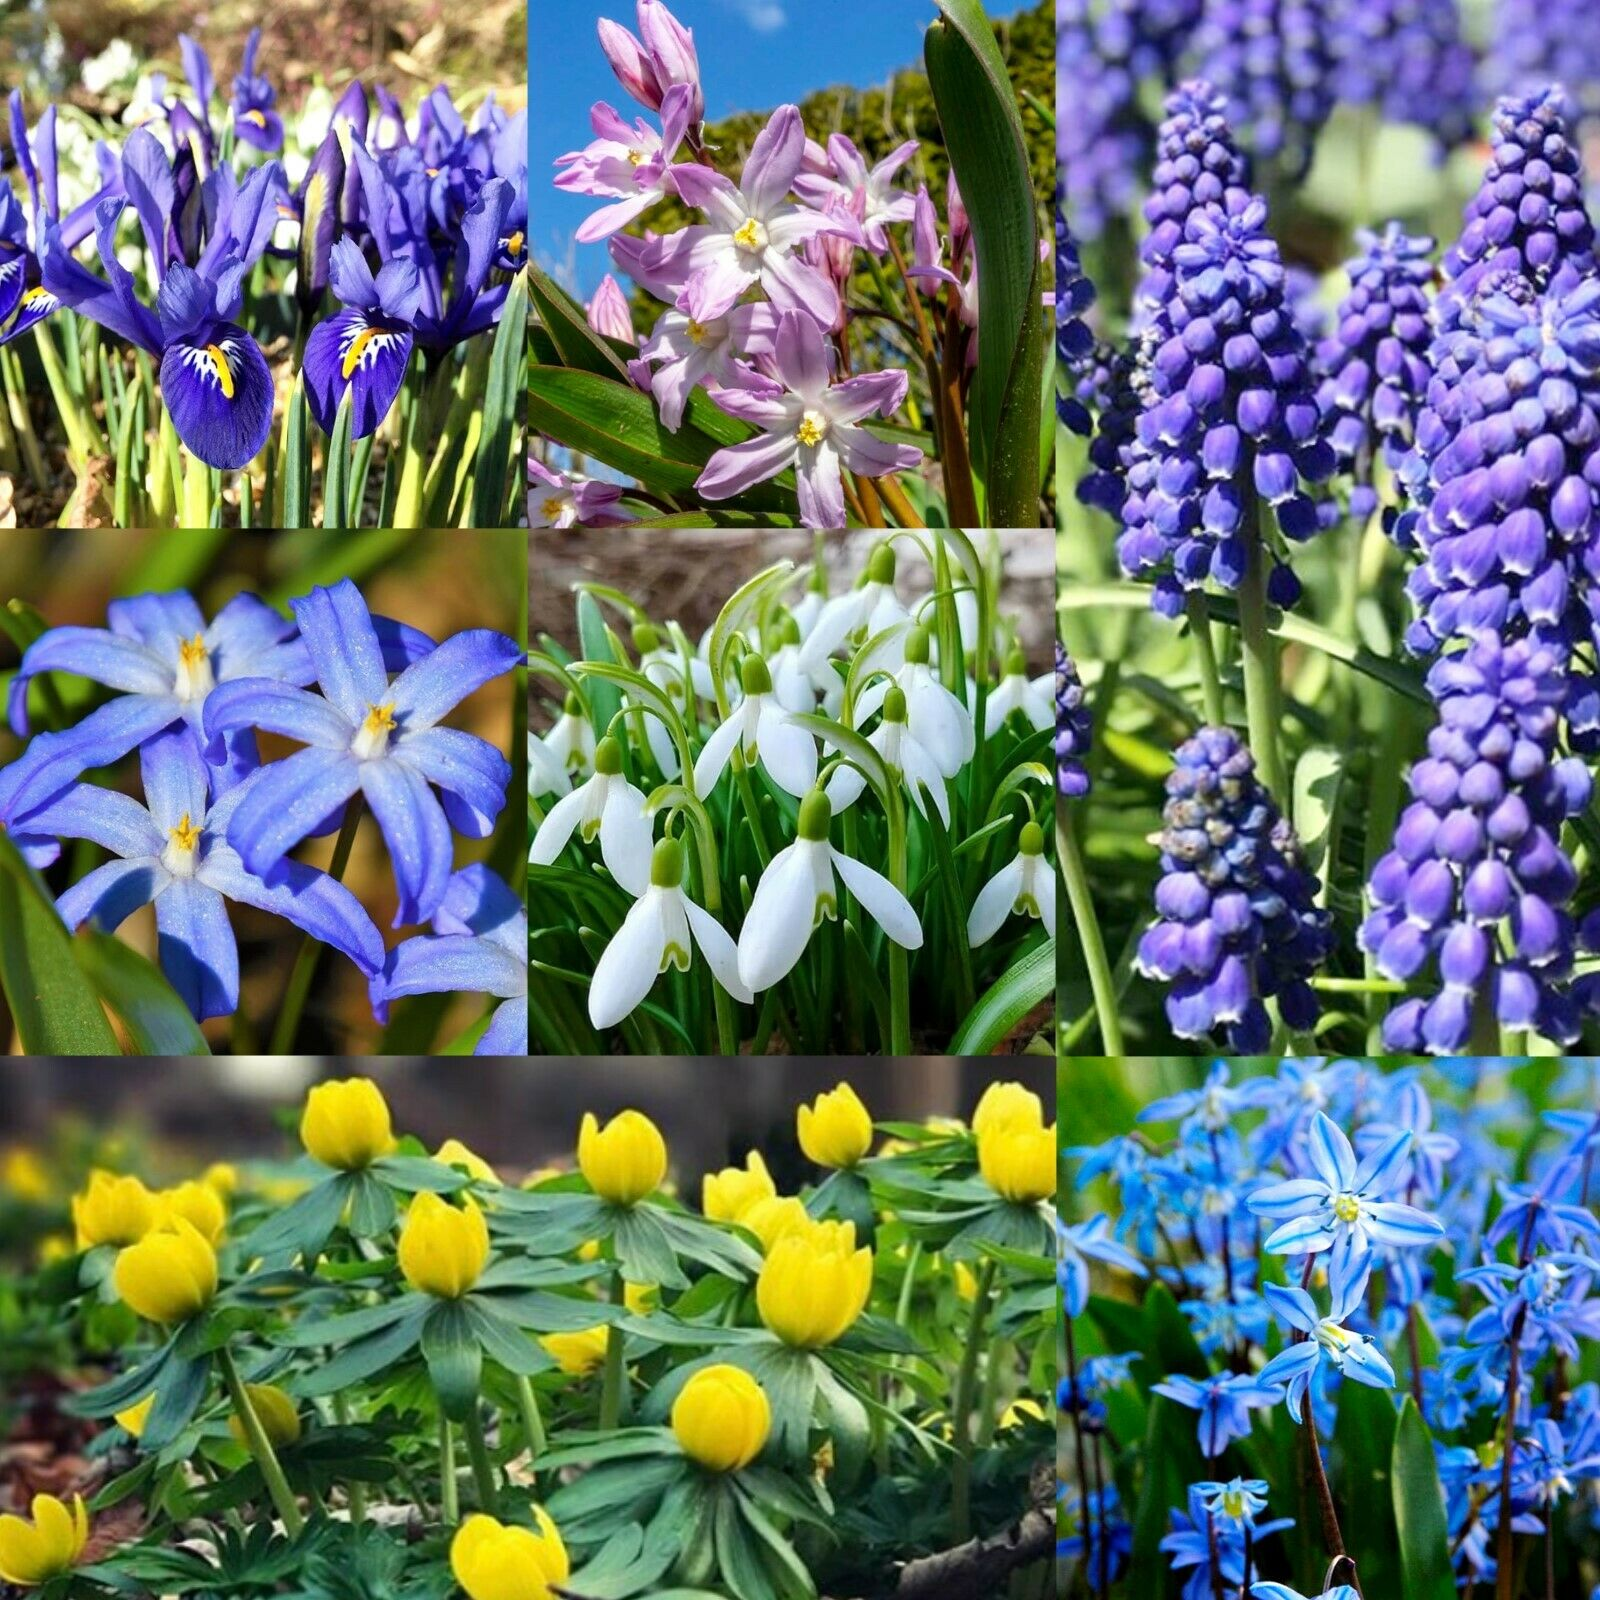 Early Flowering Bulbs Snowdrops Chionodoxa, Scilla Siberica, Aconites, Muscari,